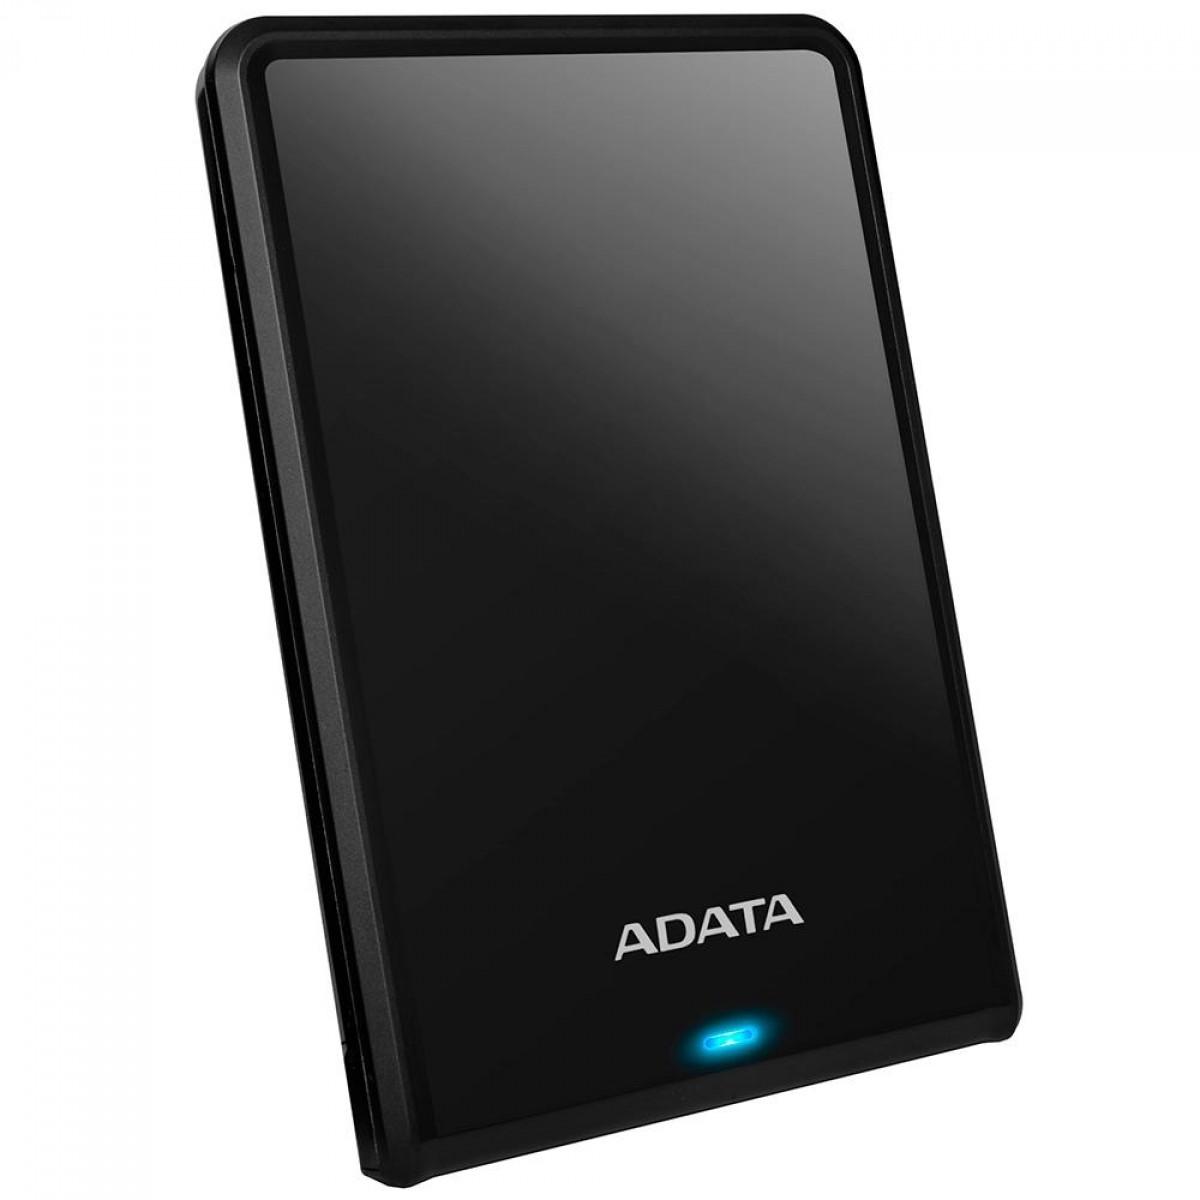 HD Externo Portátil Adata 1TB, 2.5 USB 3.0, Preto